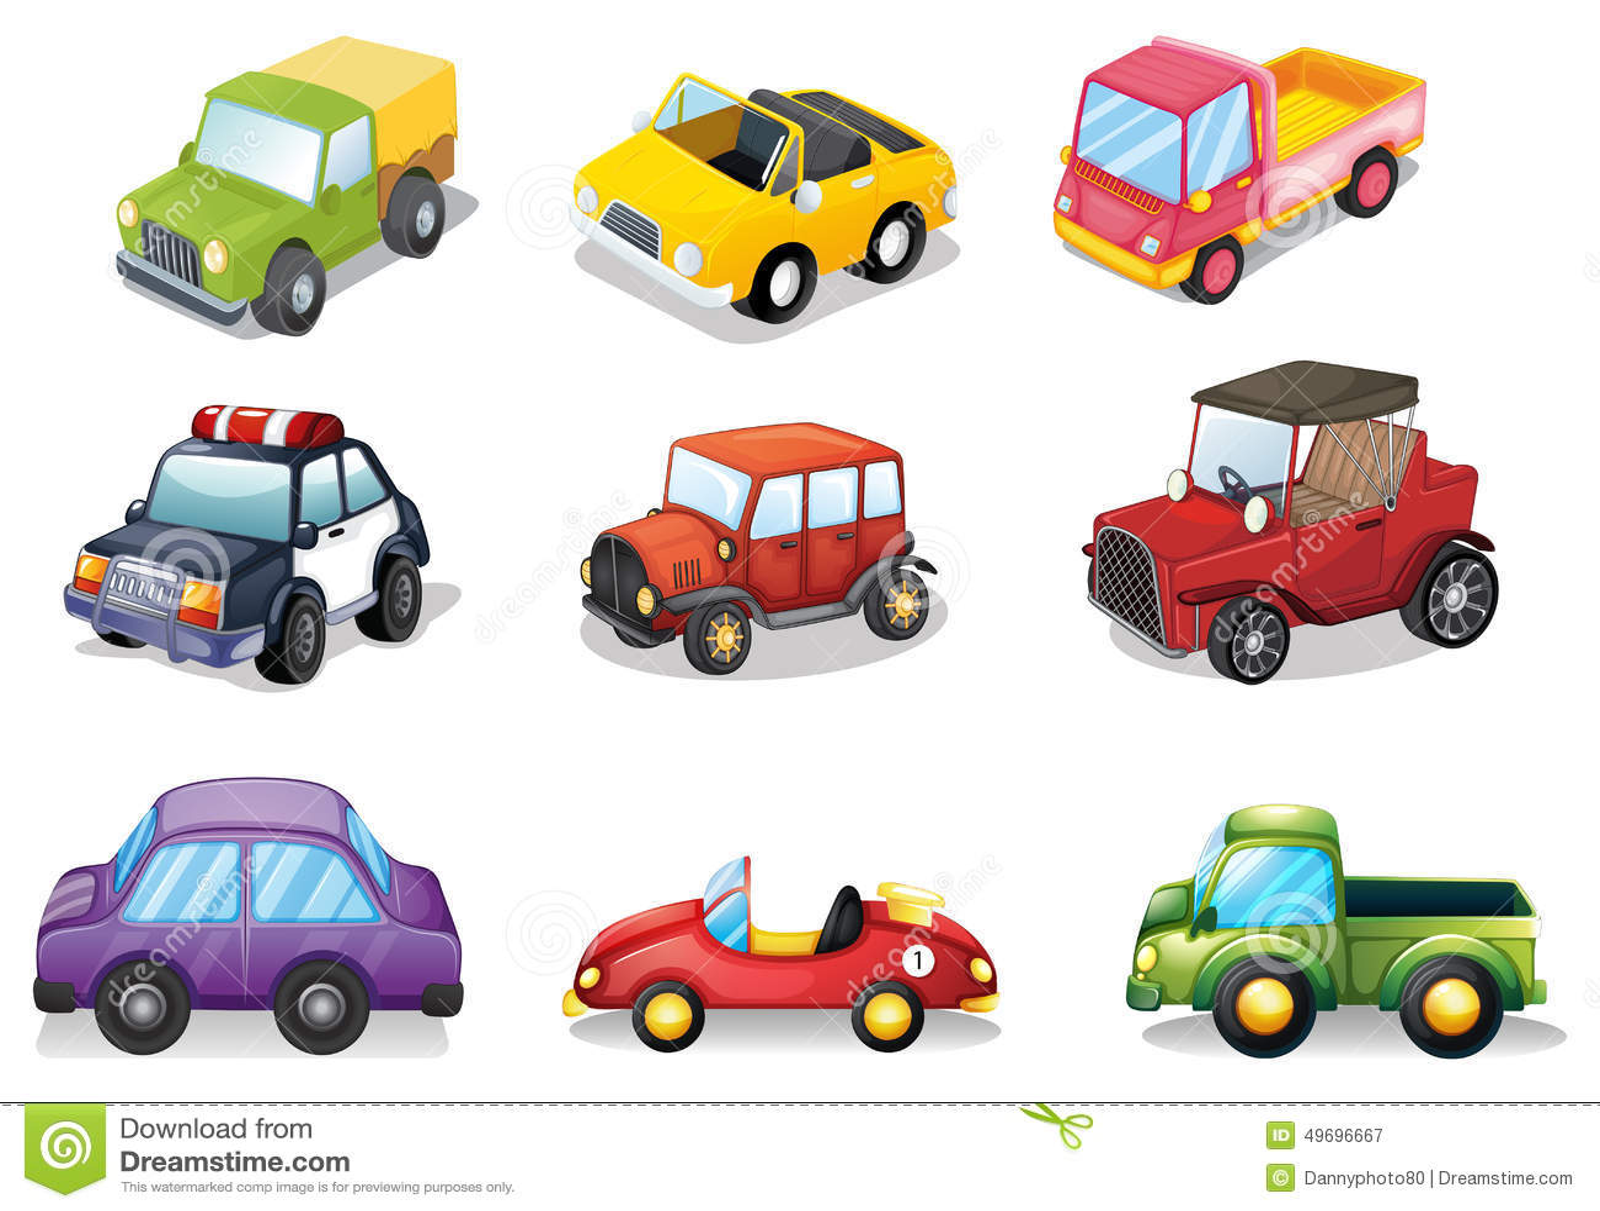 car toys stock vector image 49696667 Feed Dog Clip Art Pick Up Toys Clip Art Girl